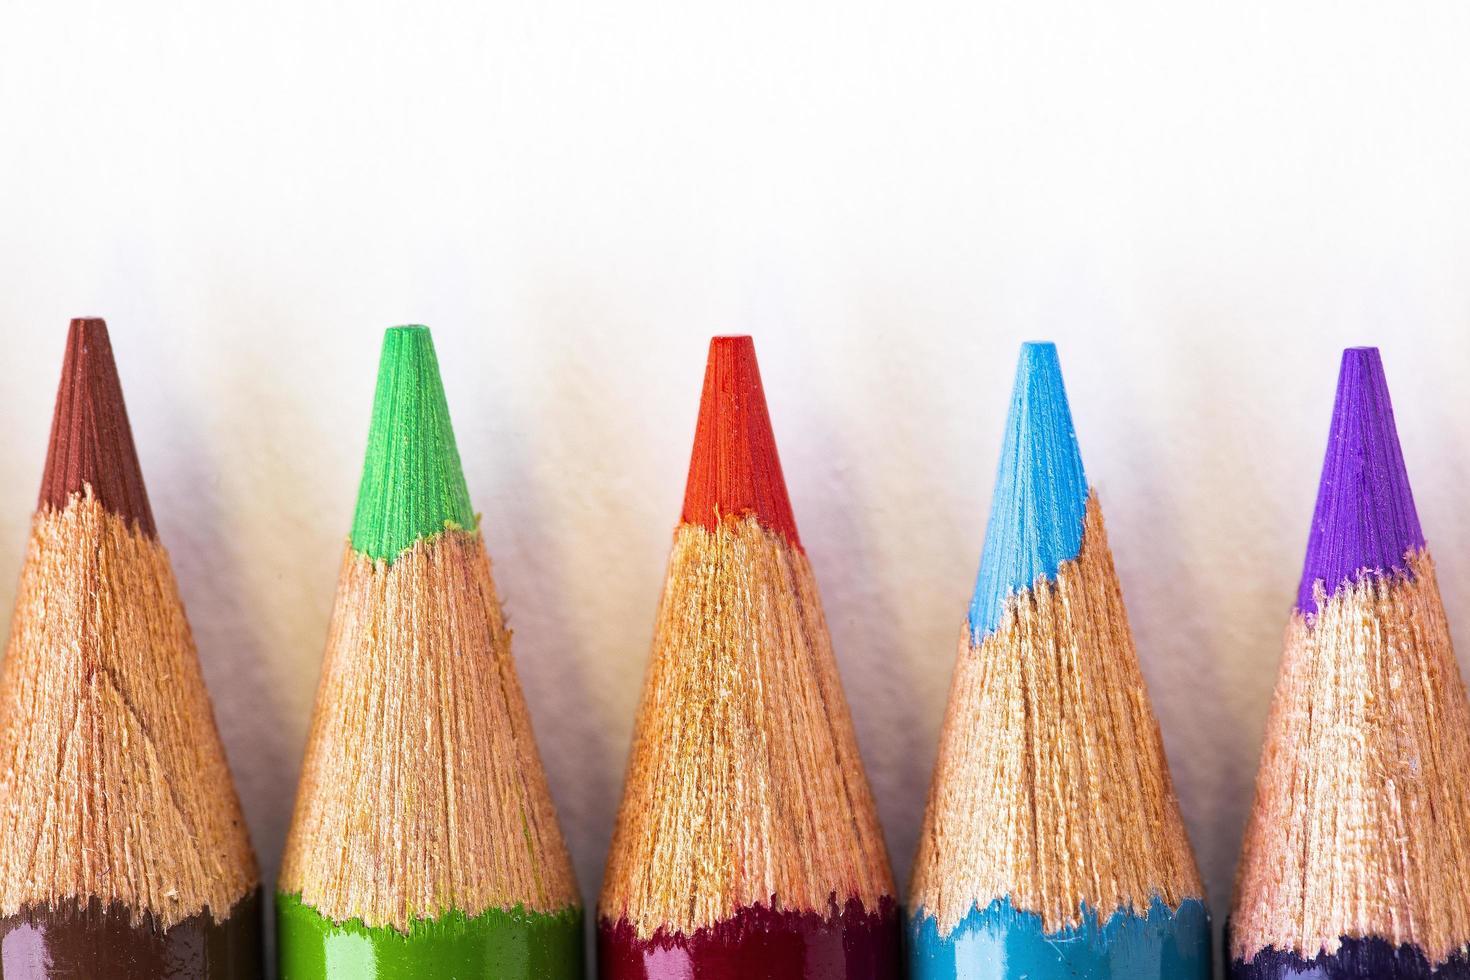 kleurrijke potloodpunten foto